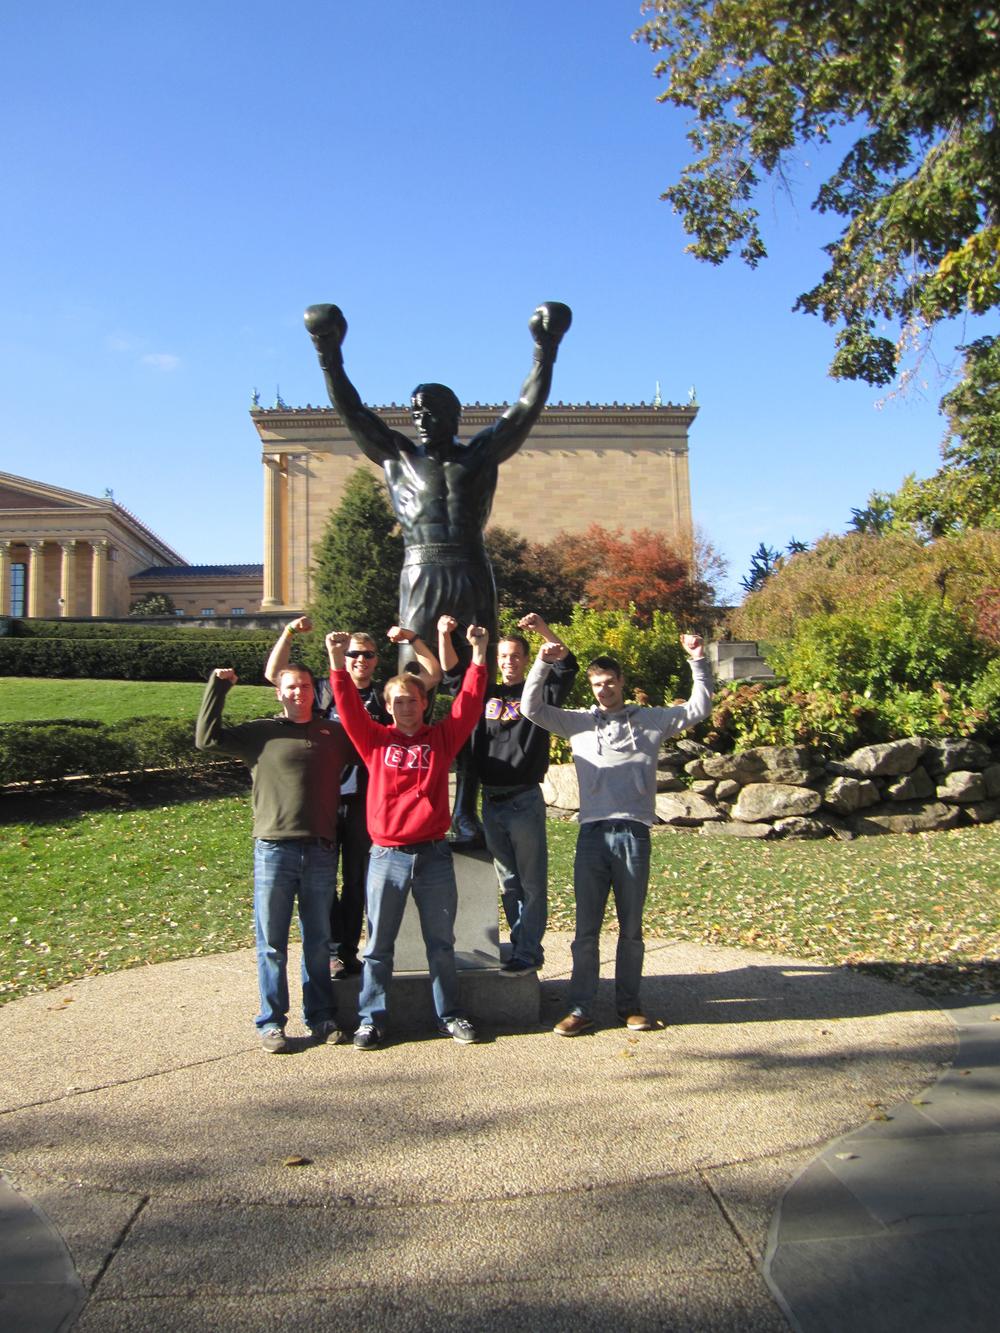 L to R: Jason Clark, Greg Smith, Gerad Freeman, Grant Gaston, and Sebastian Reigber posing with RockyFall 2011